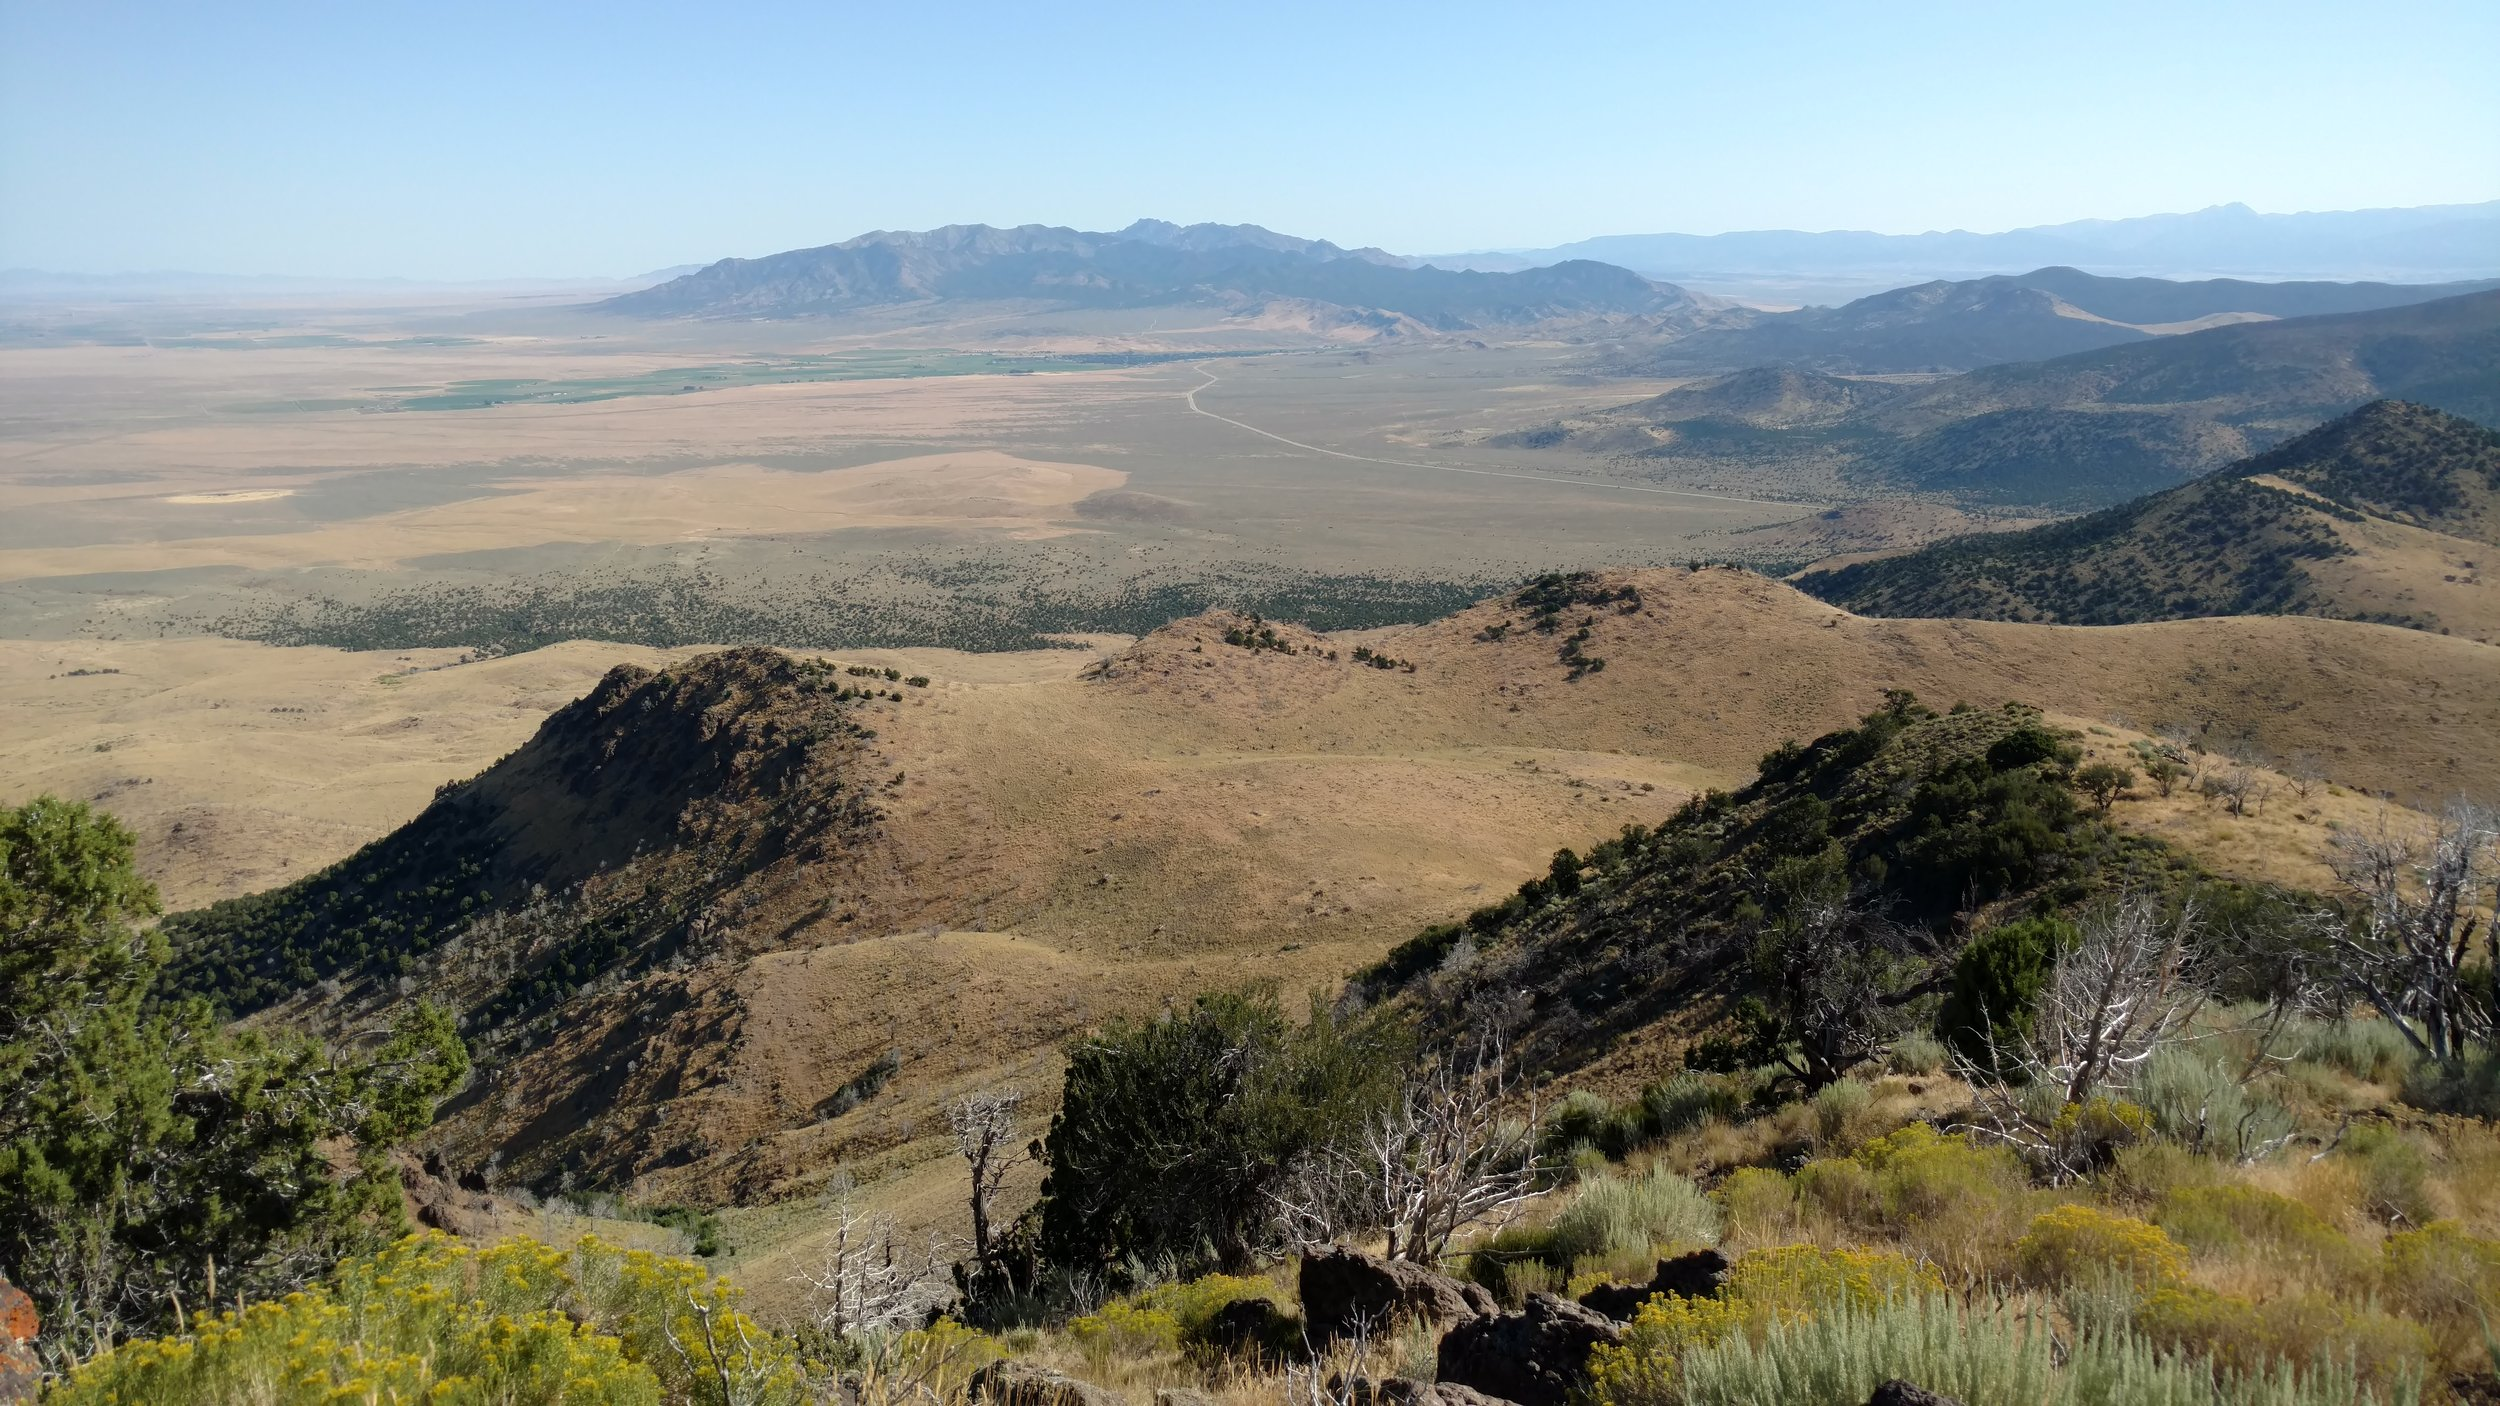 Dry Willow Peak summit view north toward the town of Minersville - UT